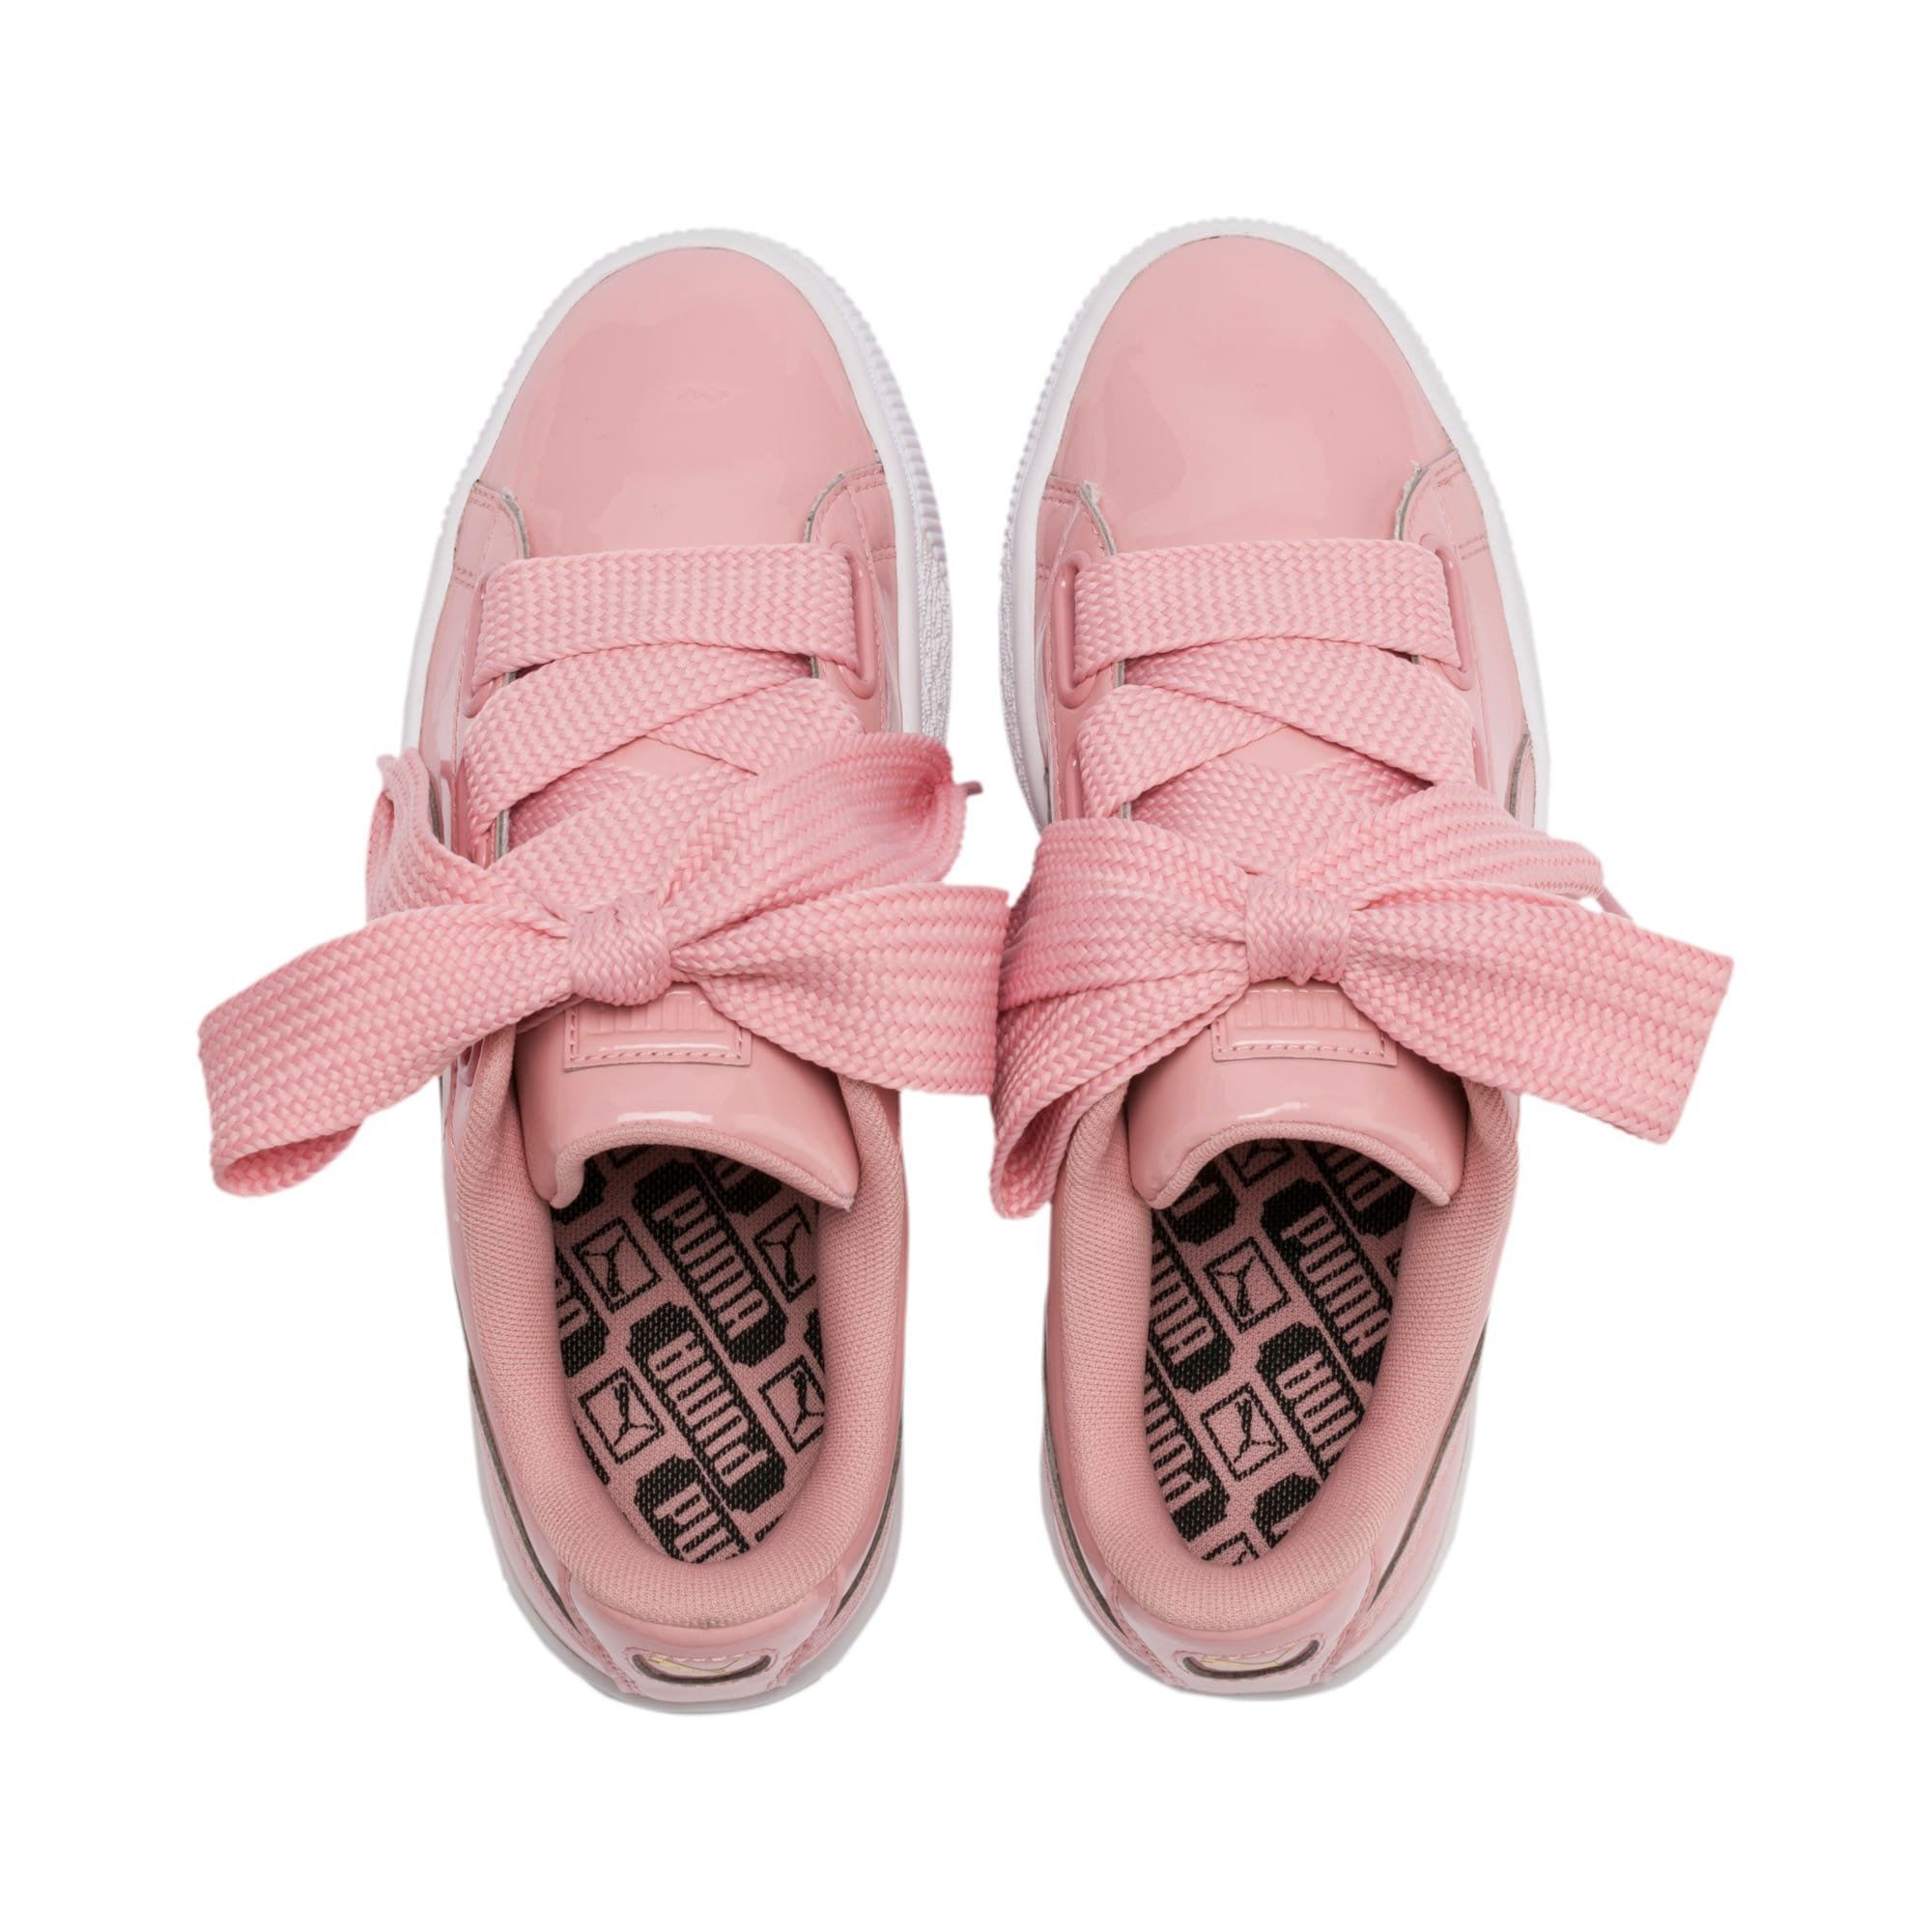 Thumbnail 7 of Basket Heart Patent Women's Sneakers, Bridal Rose-Puma Team Gold, medium